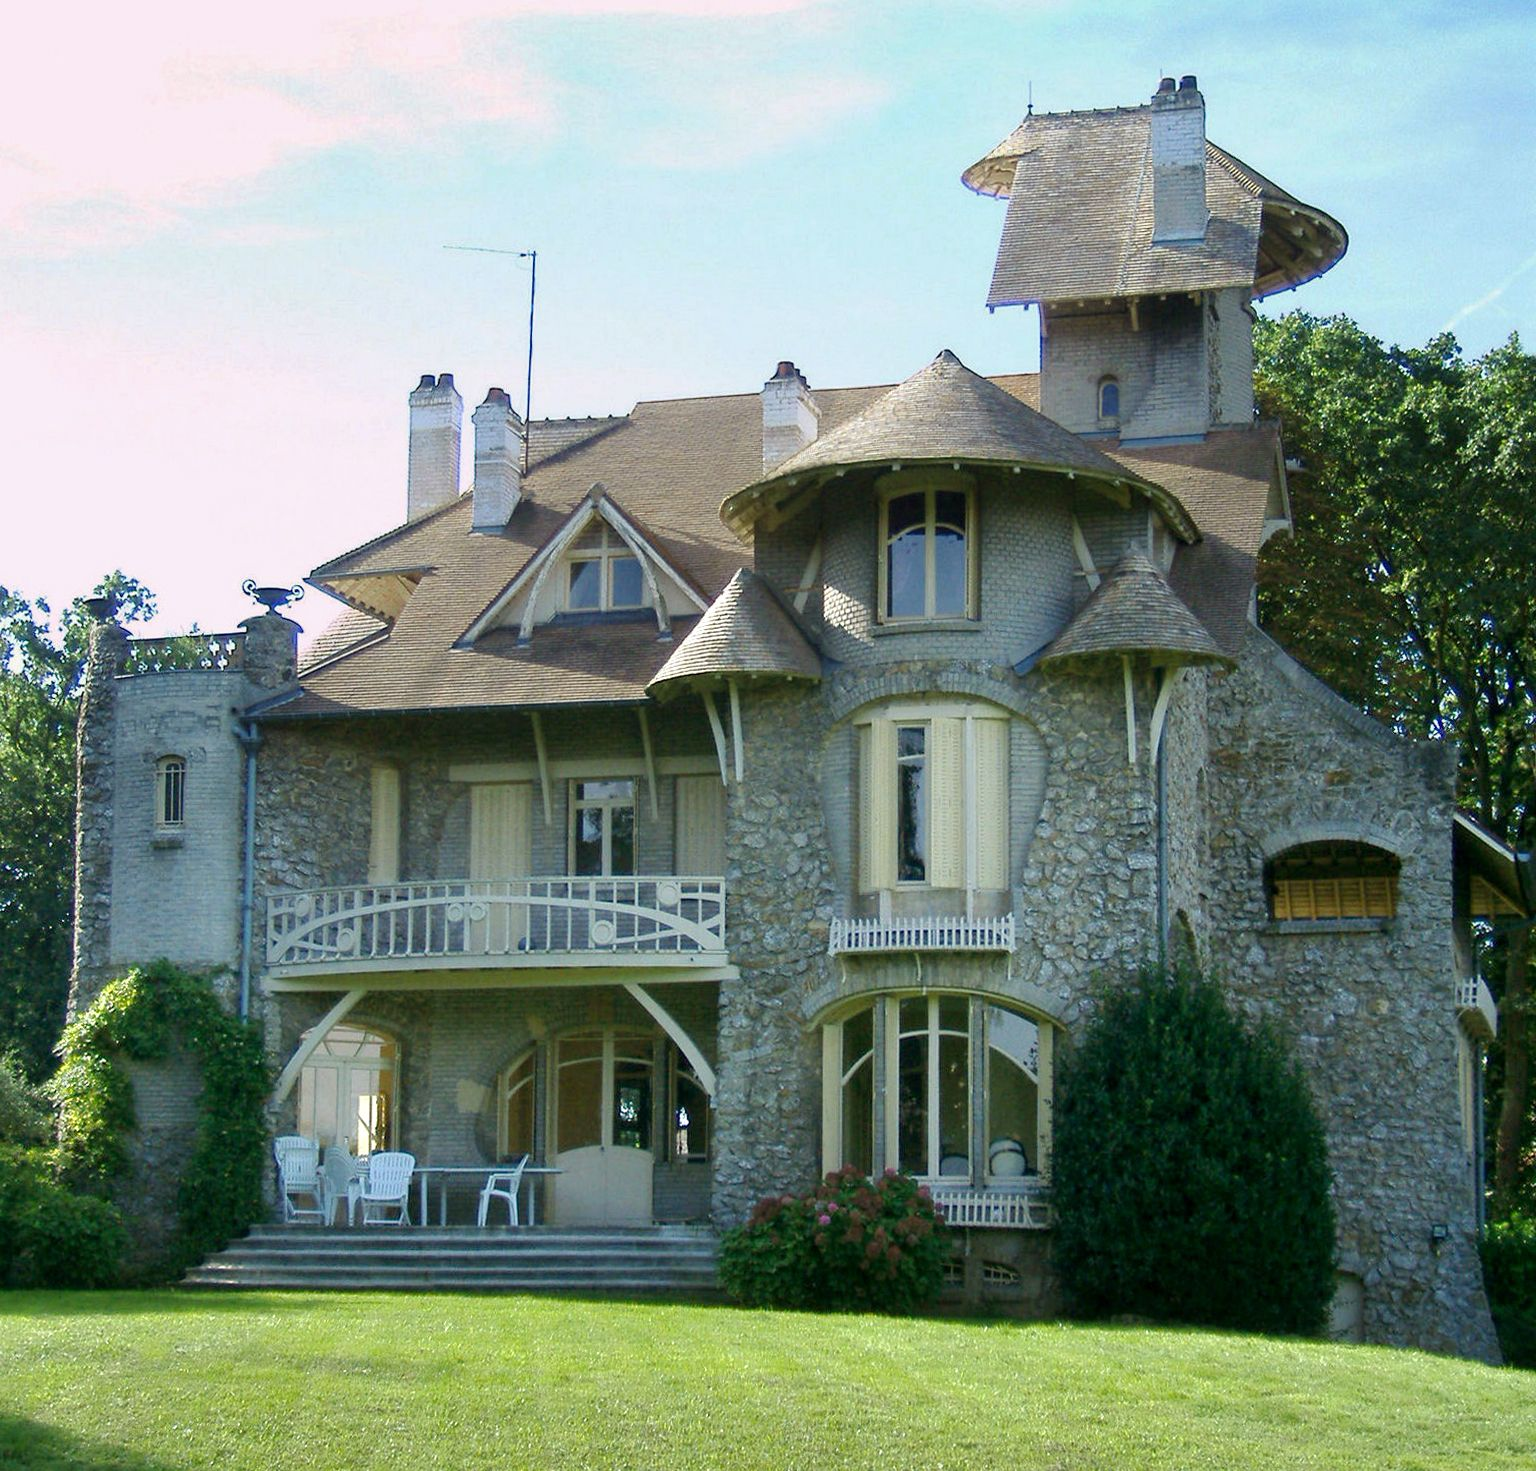 Le Castel Hector Guimard, 1904 Architecture